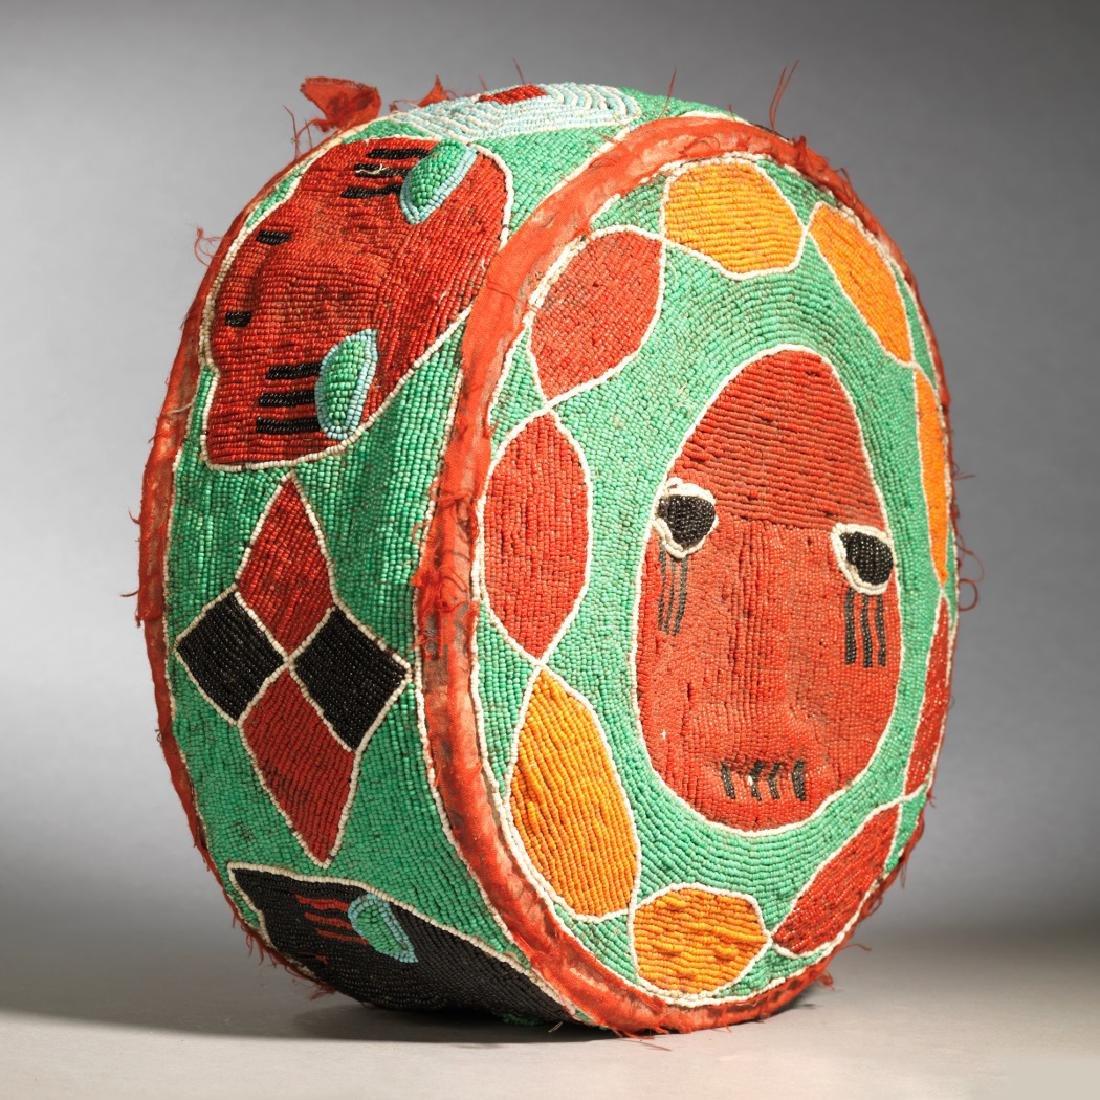 Yoruba Royal Foot Cushion Tribal Art - 6